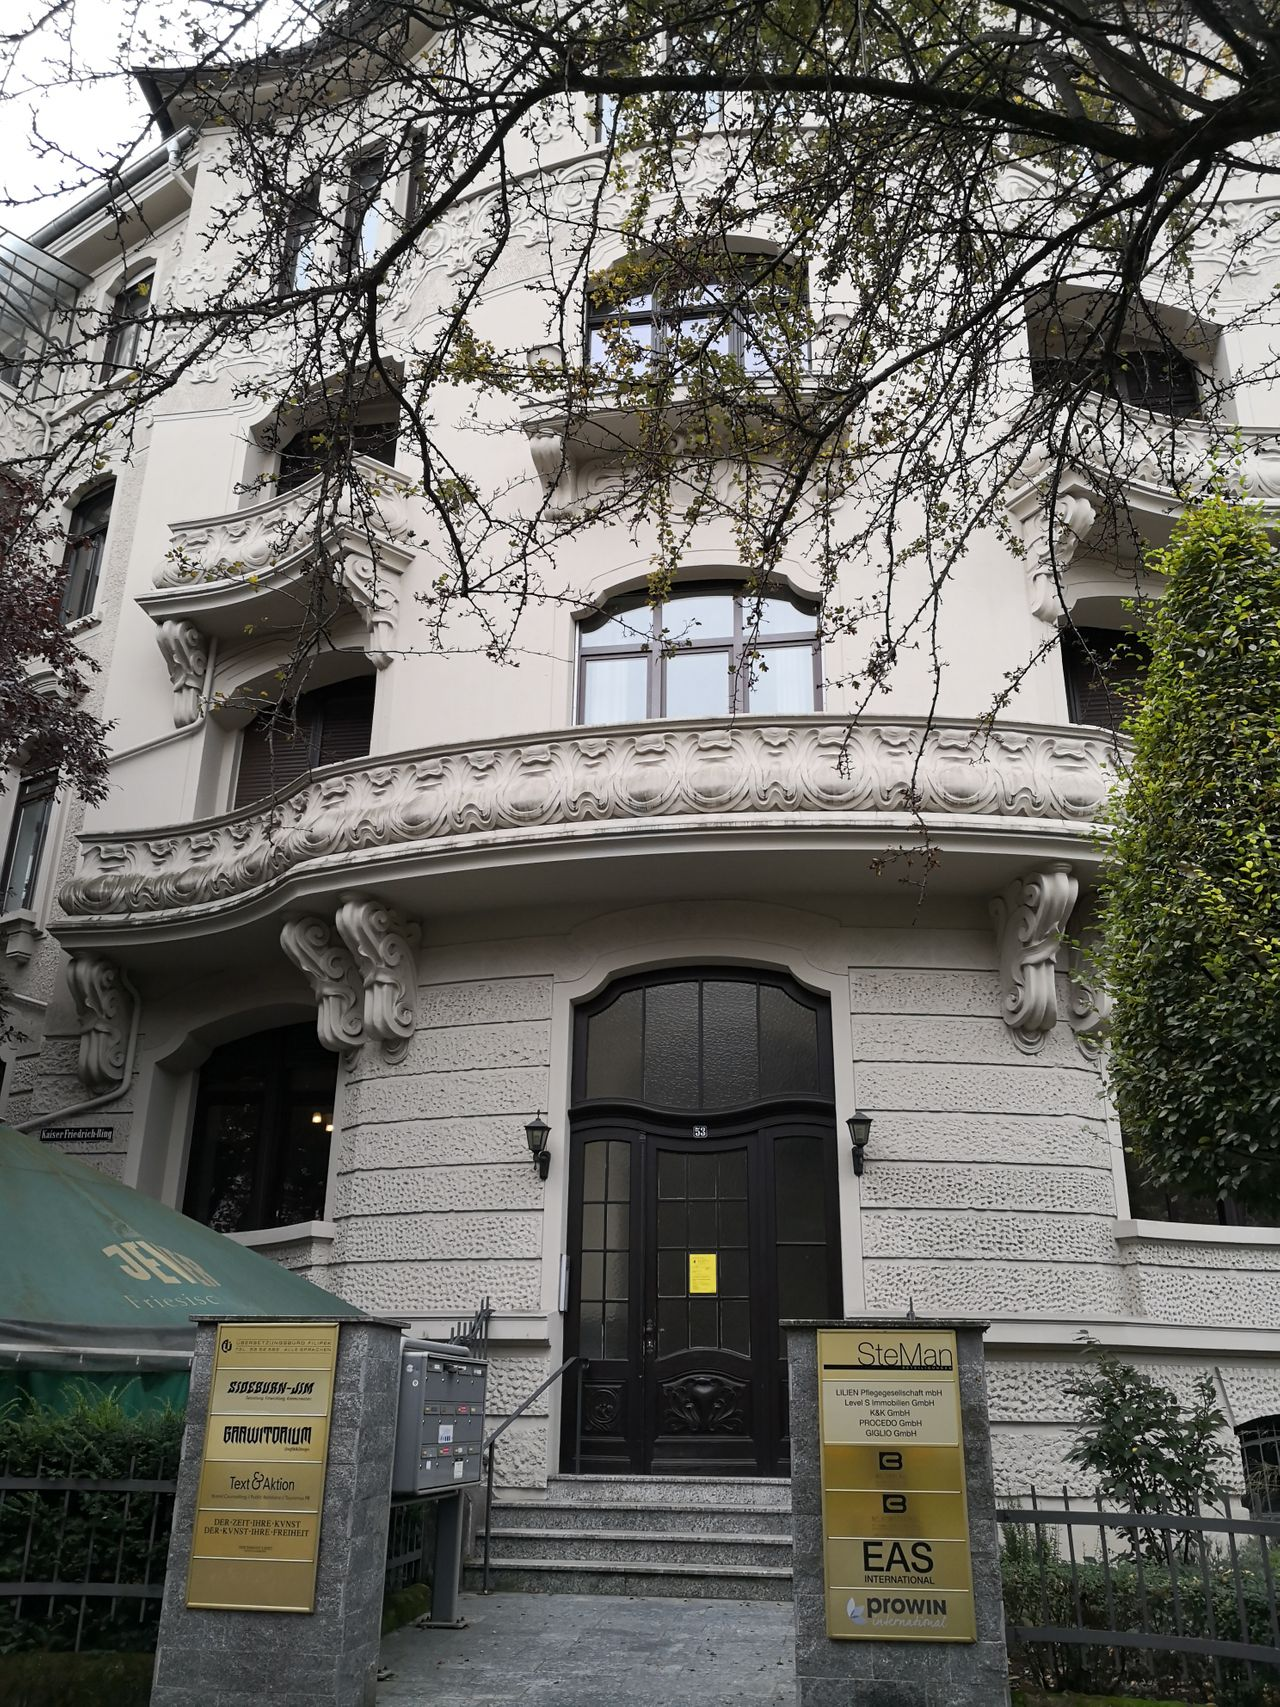 Kaiser-Friedrich-Ring